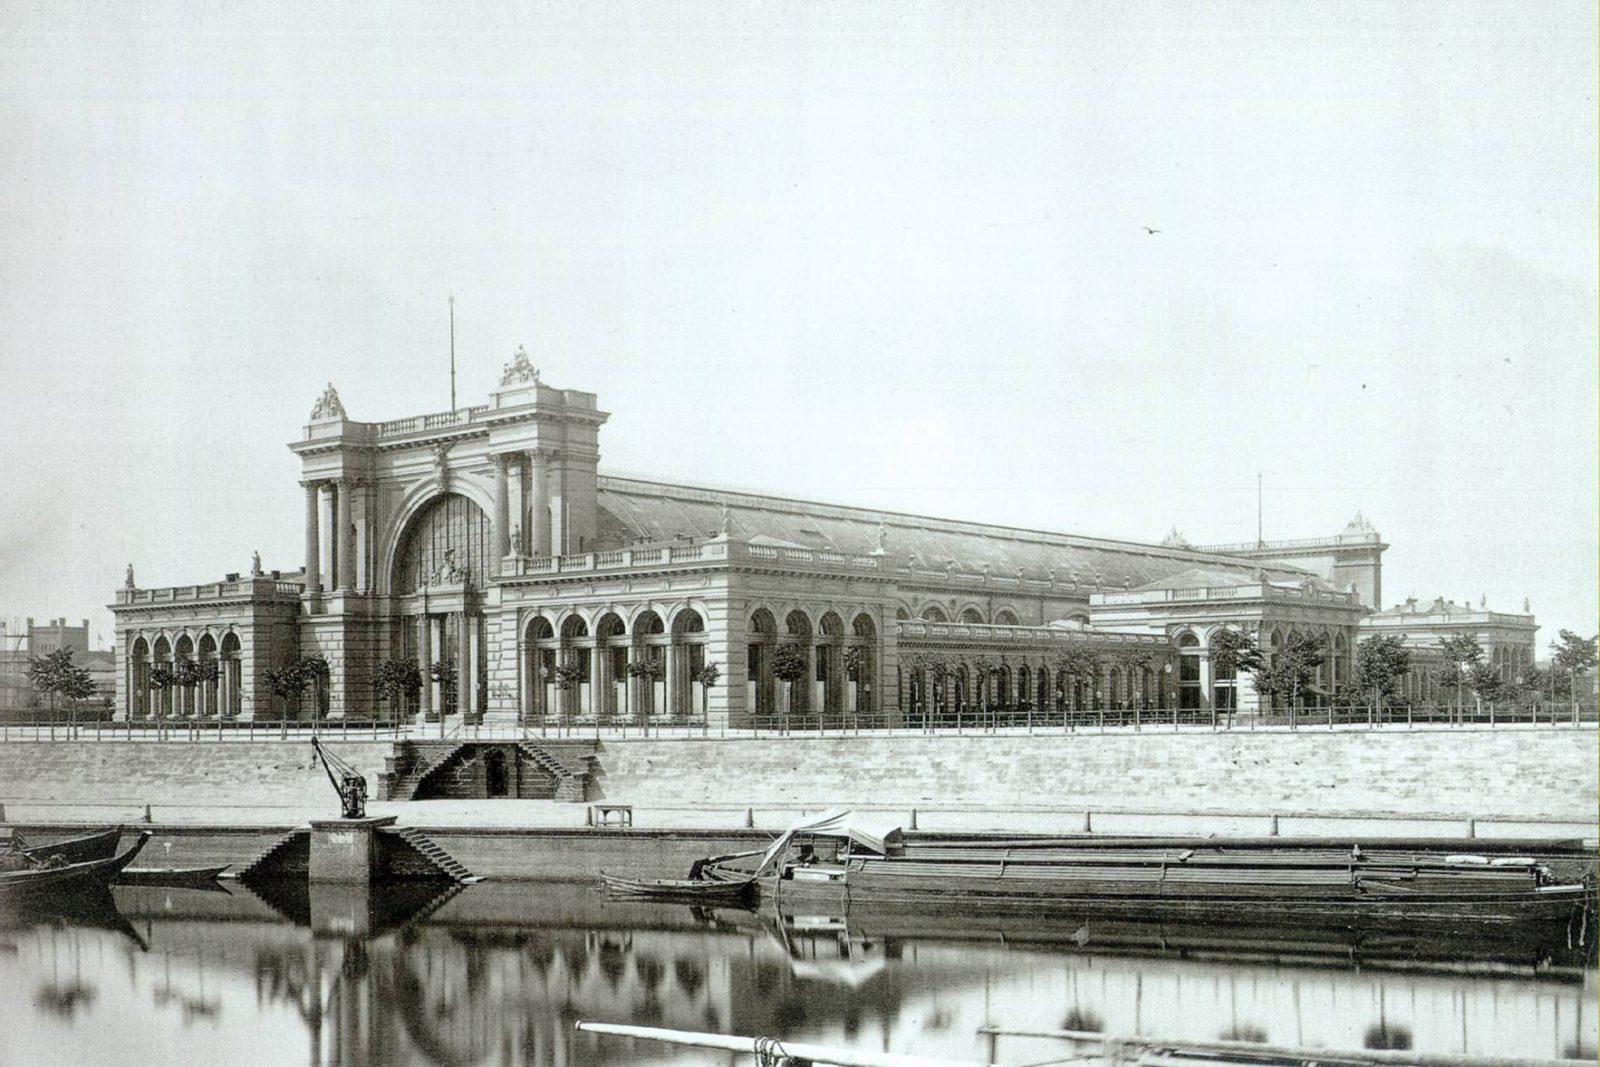 Lehrter Bahnhof in 1879